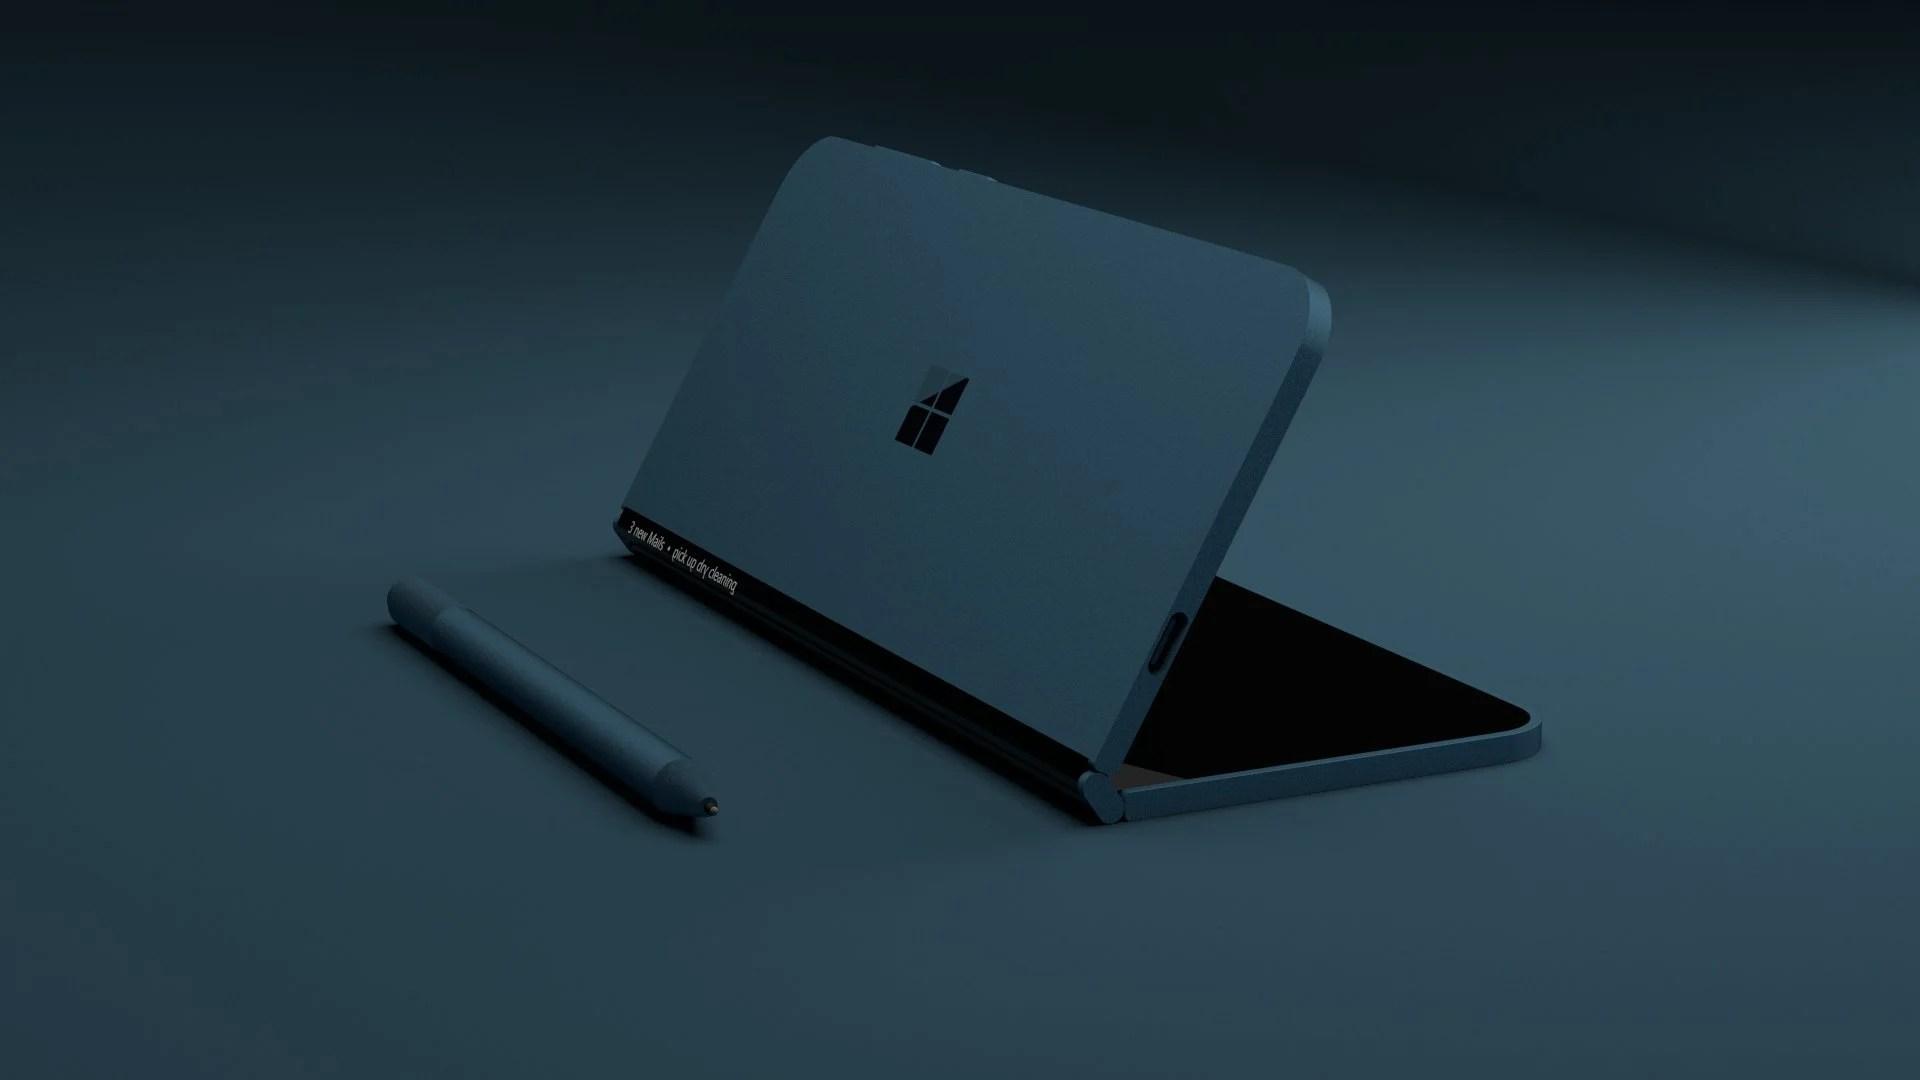 Microsoft Surface Andromeda : le smartphone 2-en-1 sortirait en 2018